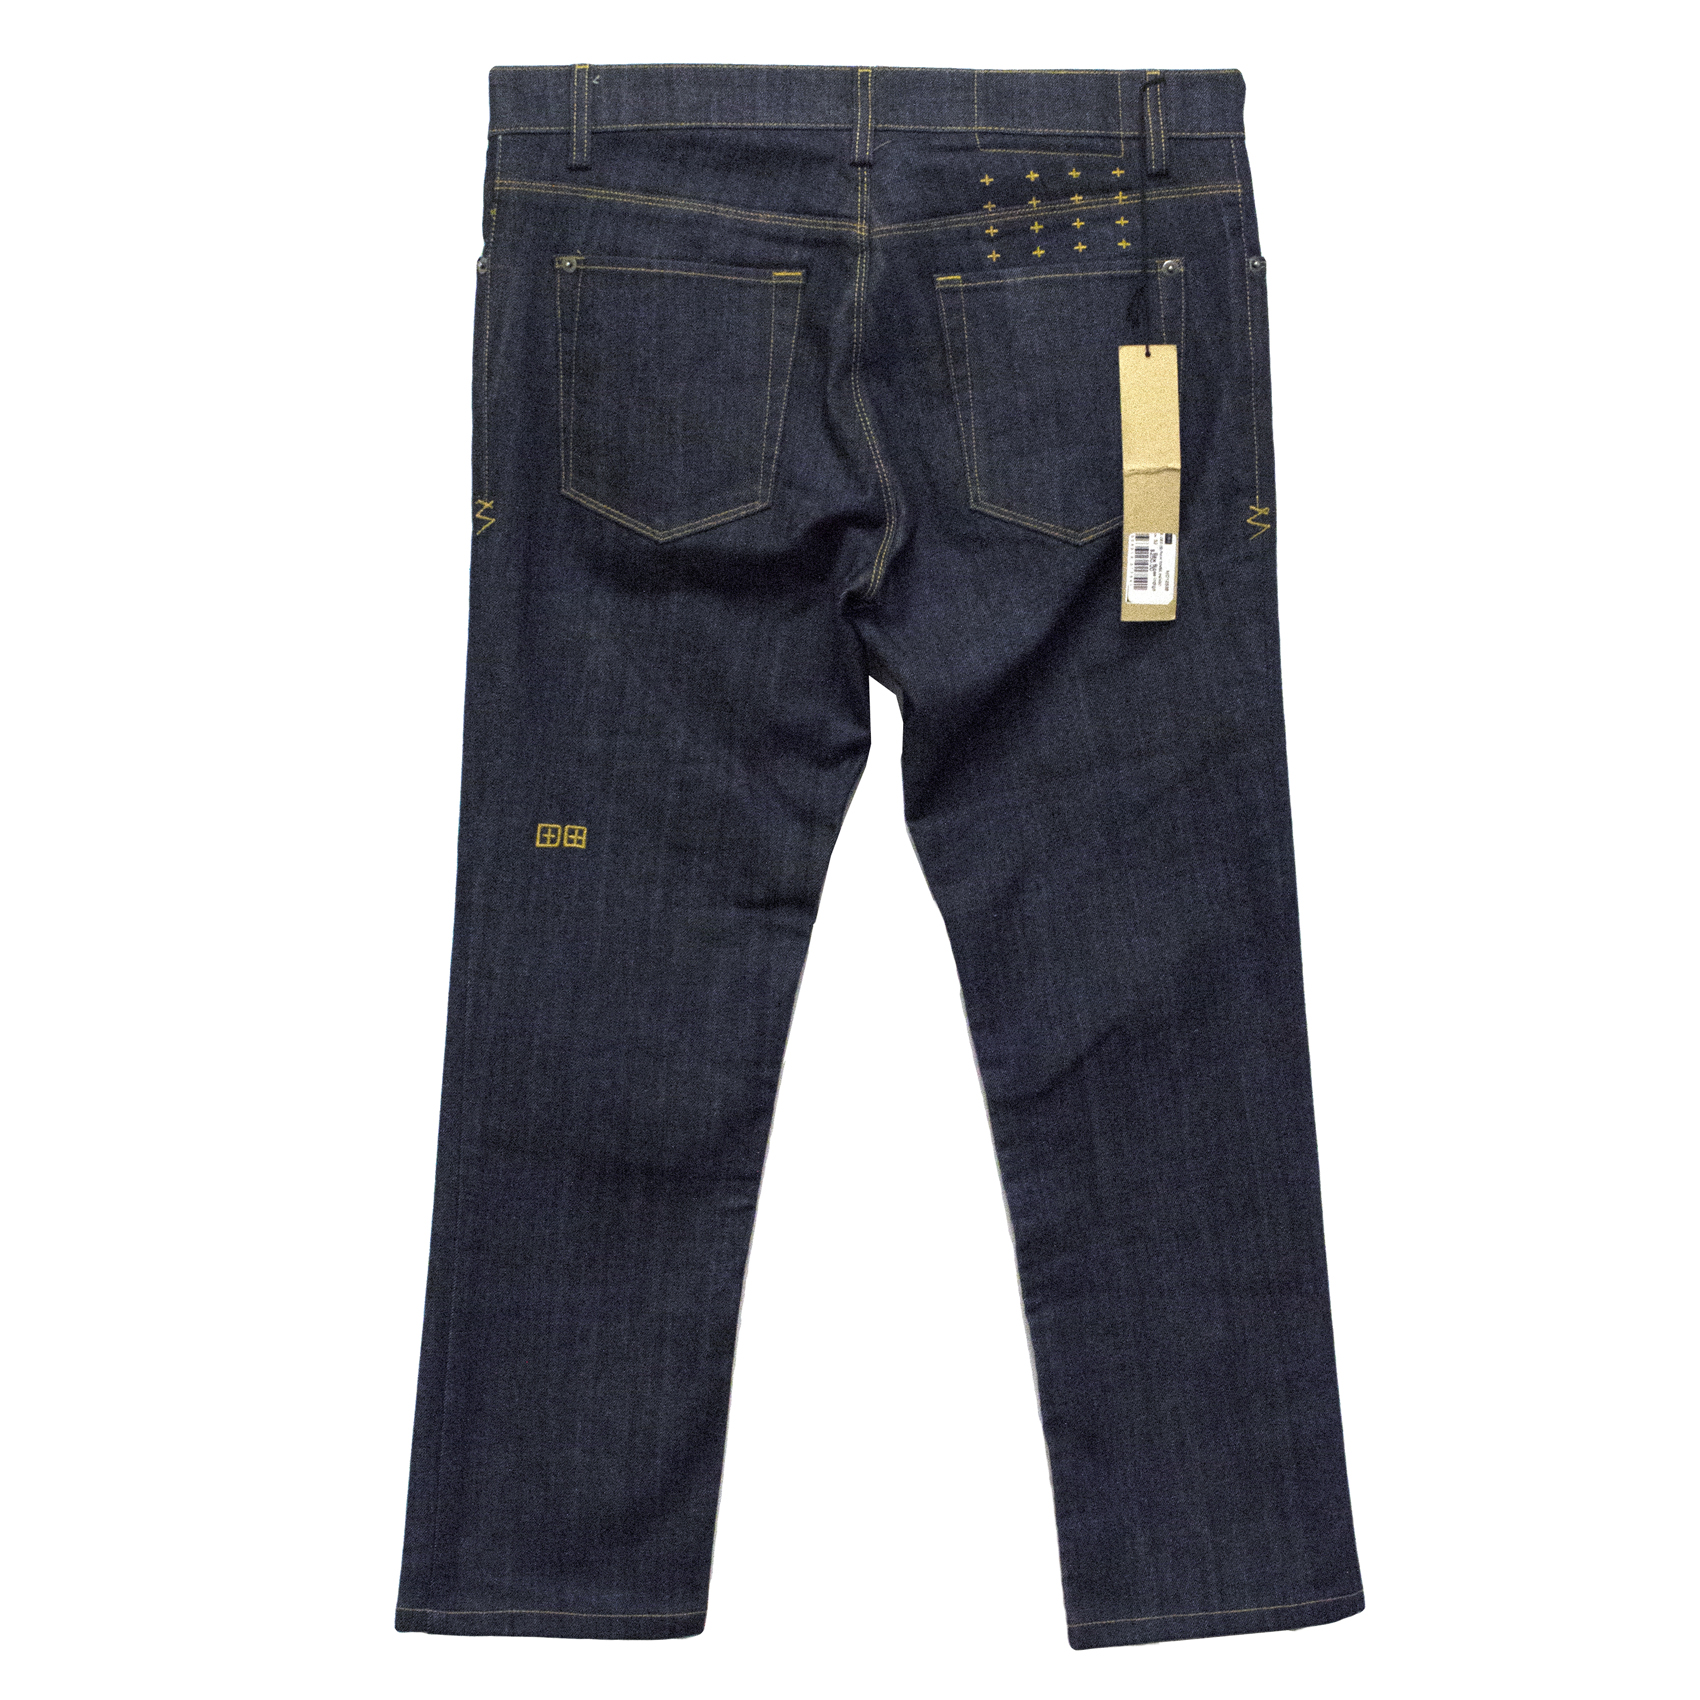 Ksubi Raw Rinse Indigo Jeans